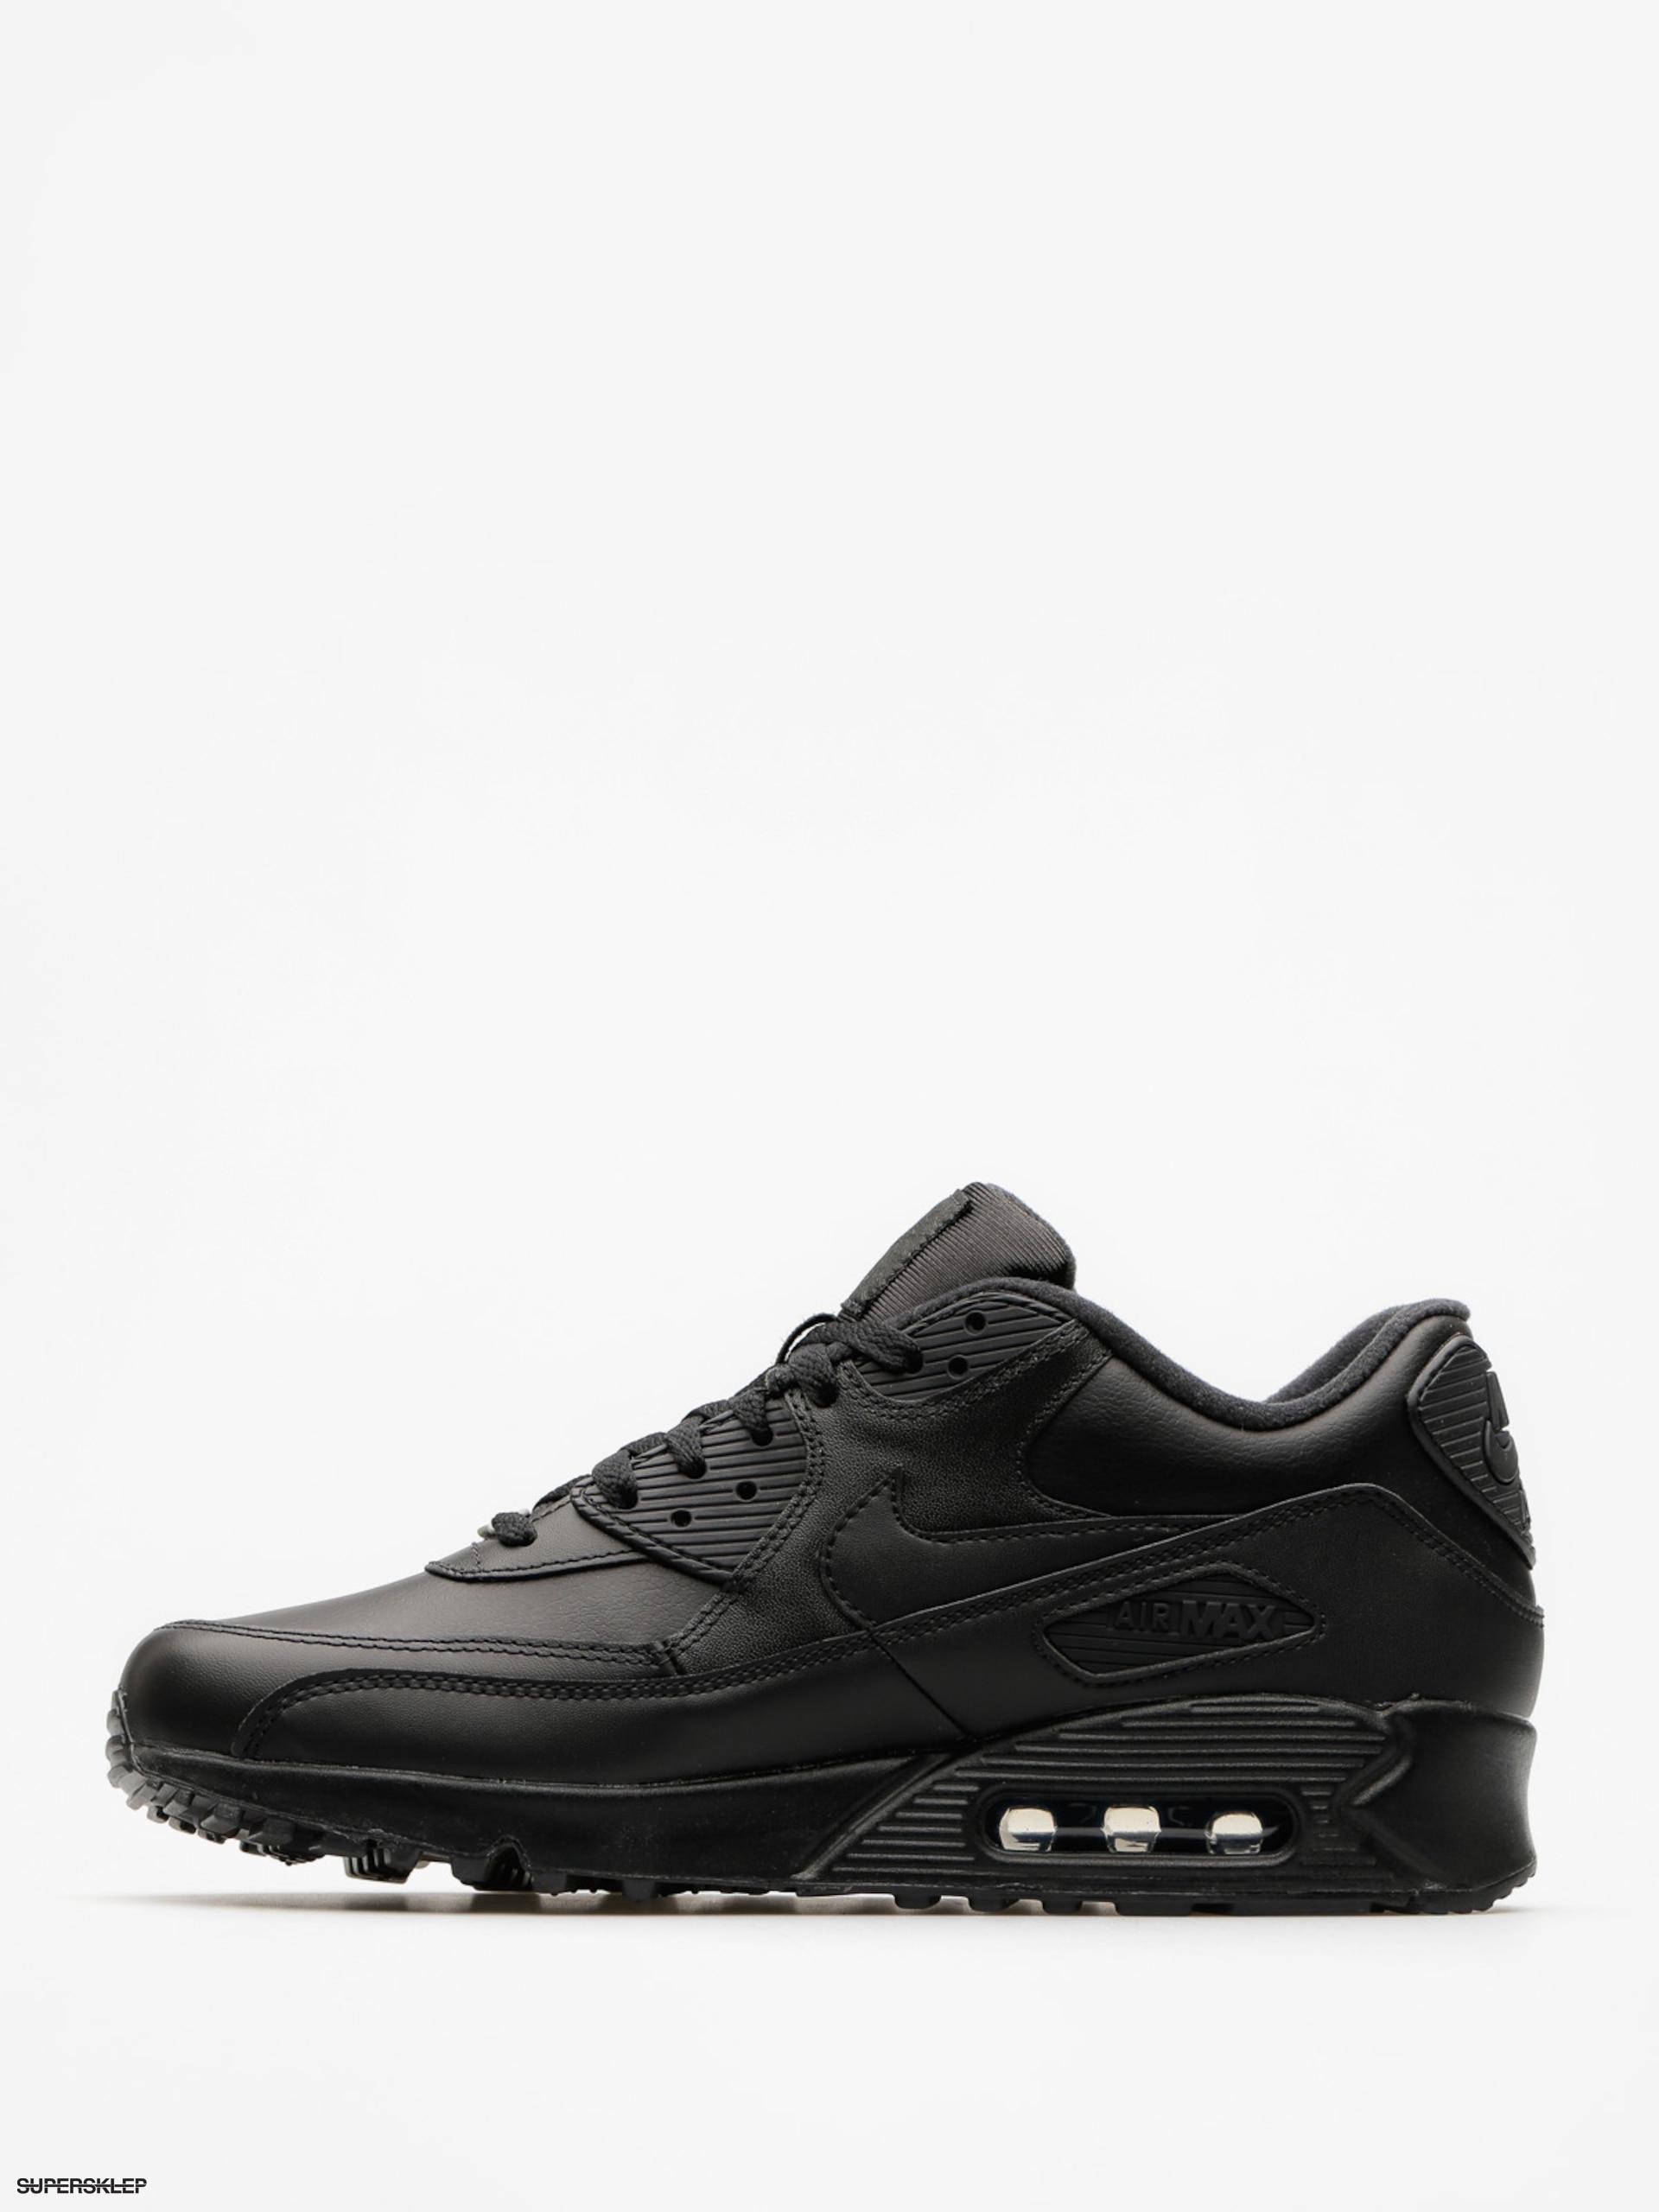 Buty Nike Air Max 90 (Leather black/black)